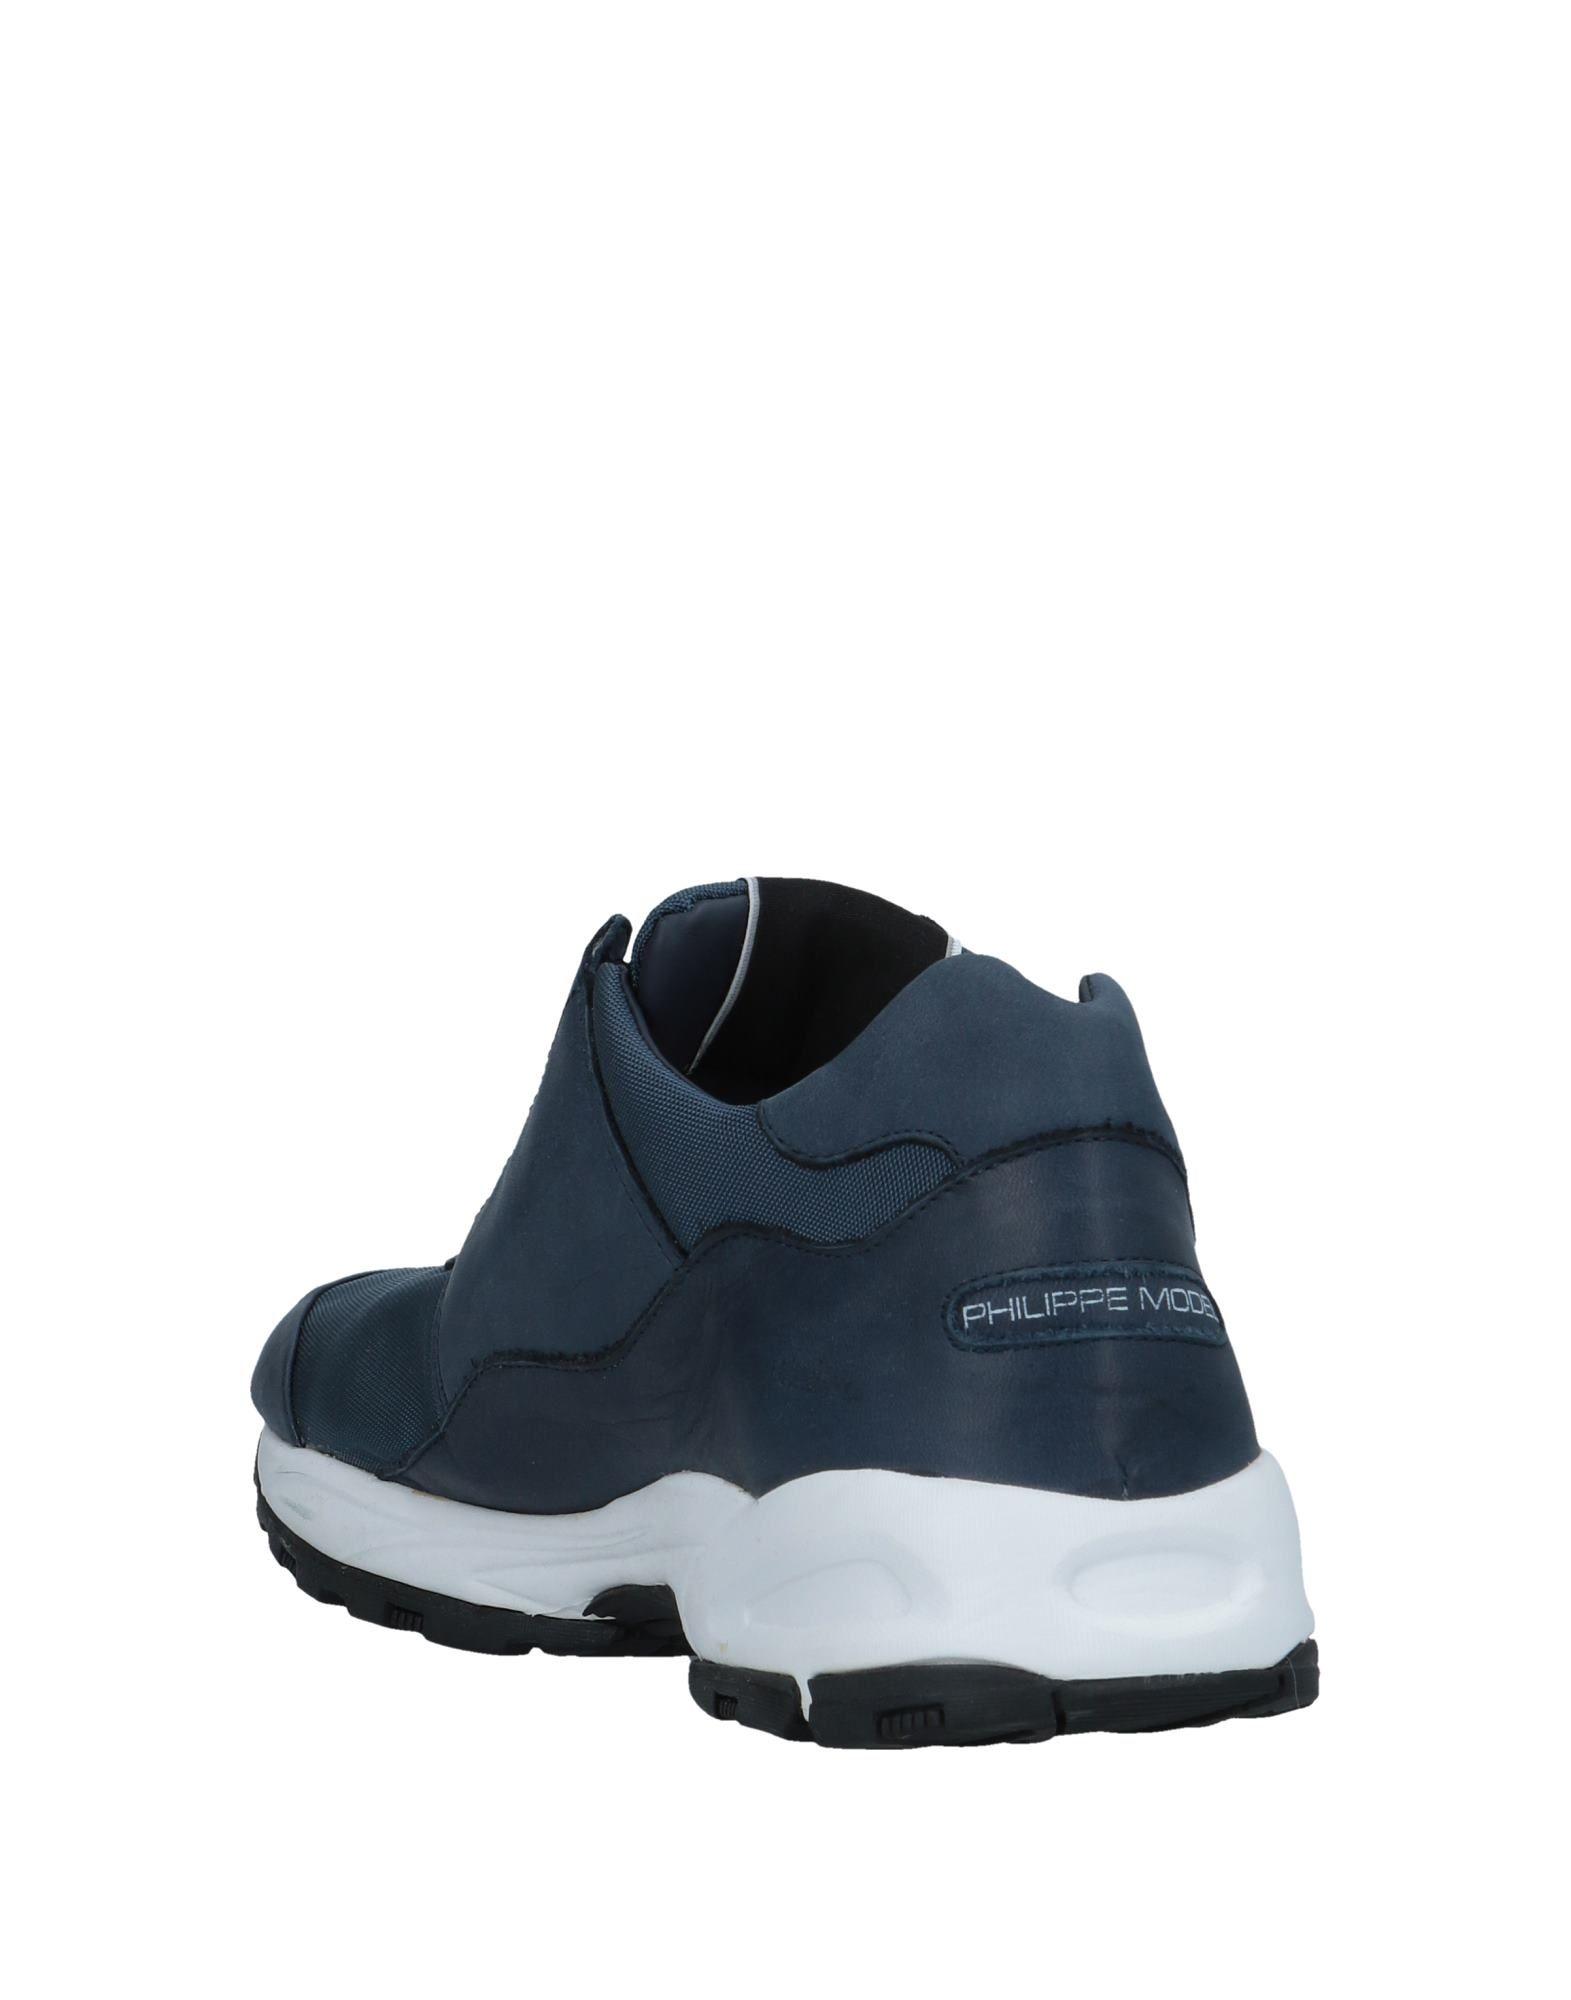 Philippe 11500630IX Model Sneakers Herren  11500630IX Philippe Gute Qualität beliebte Schuhe 051b6c